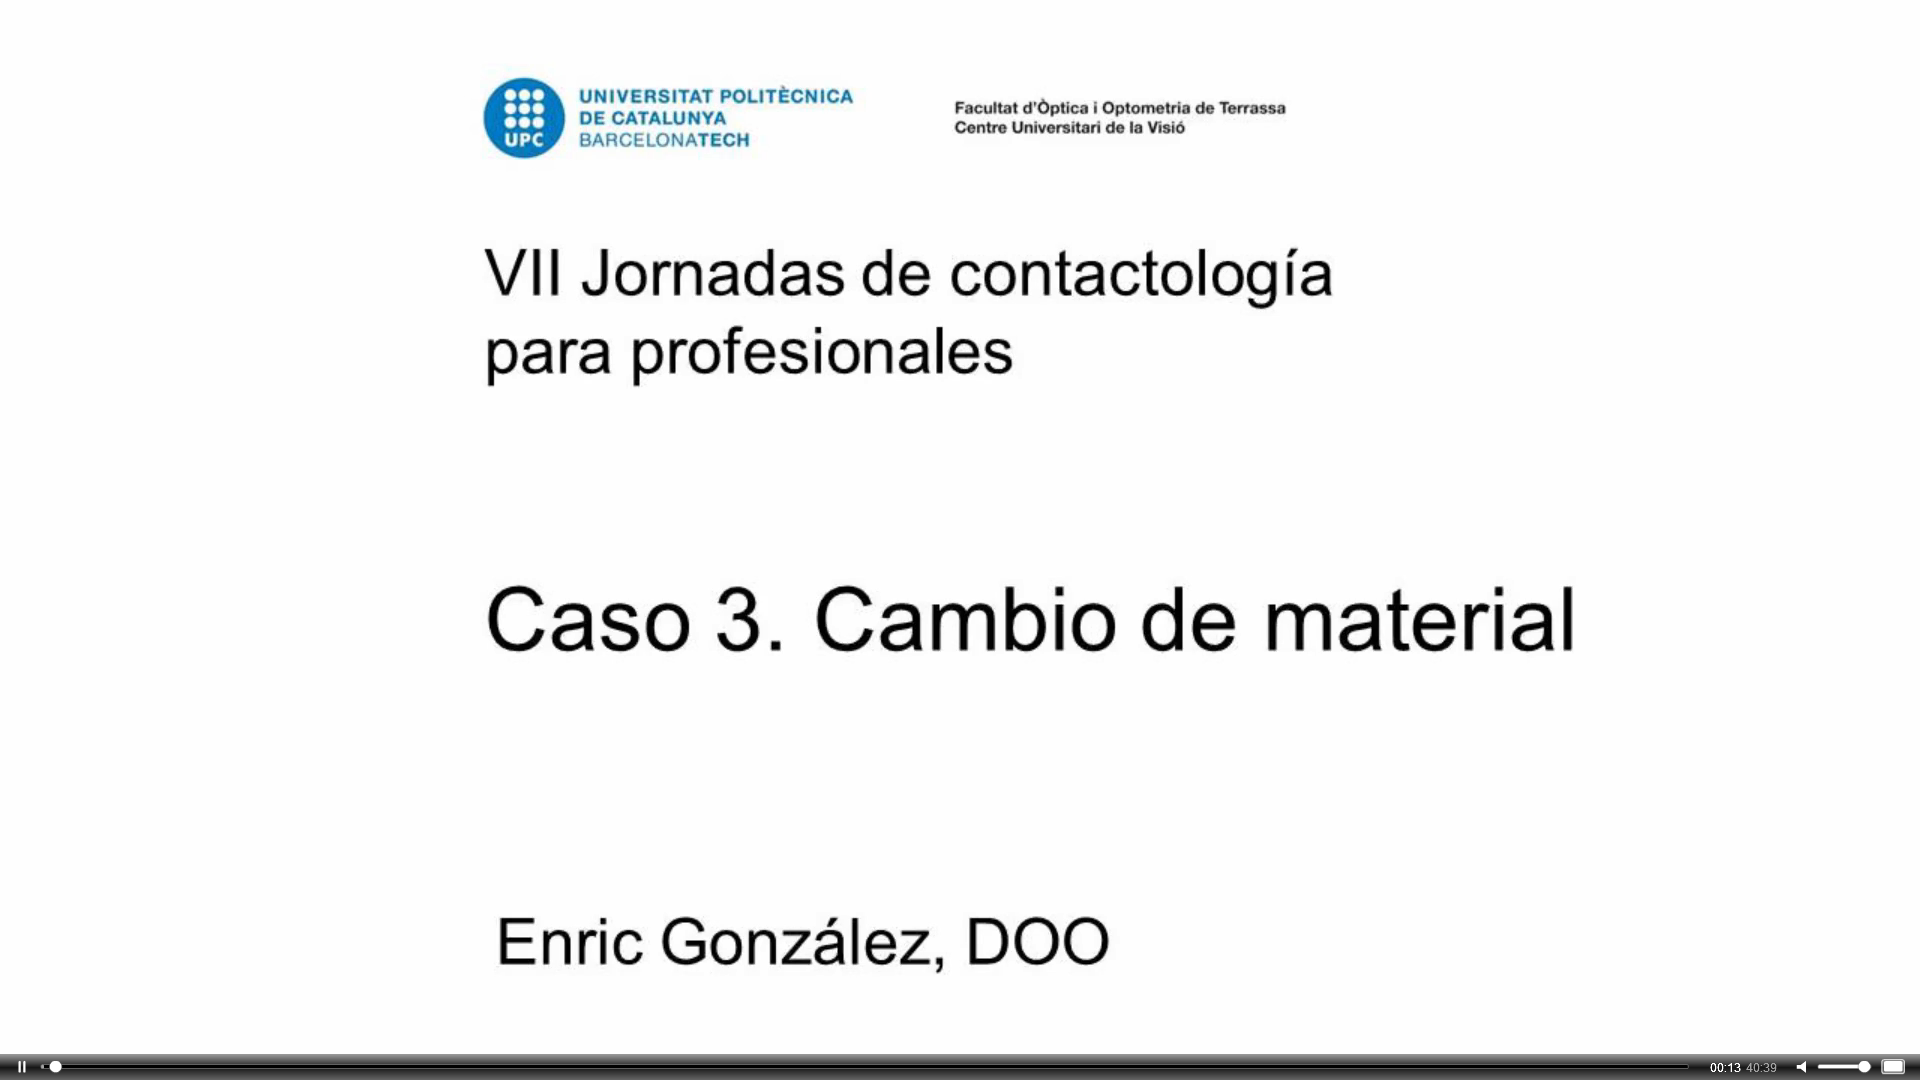 JLC2017_caso_3(Enric_Gonzalez)